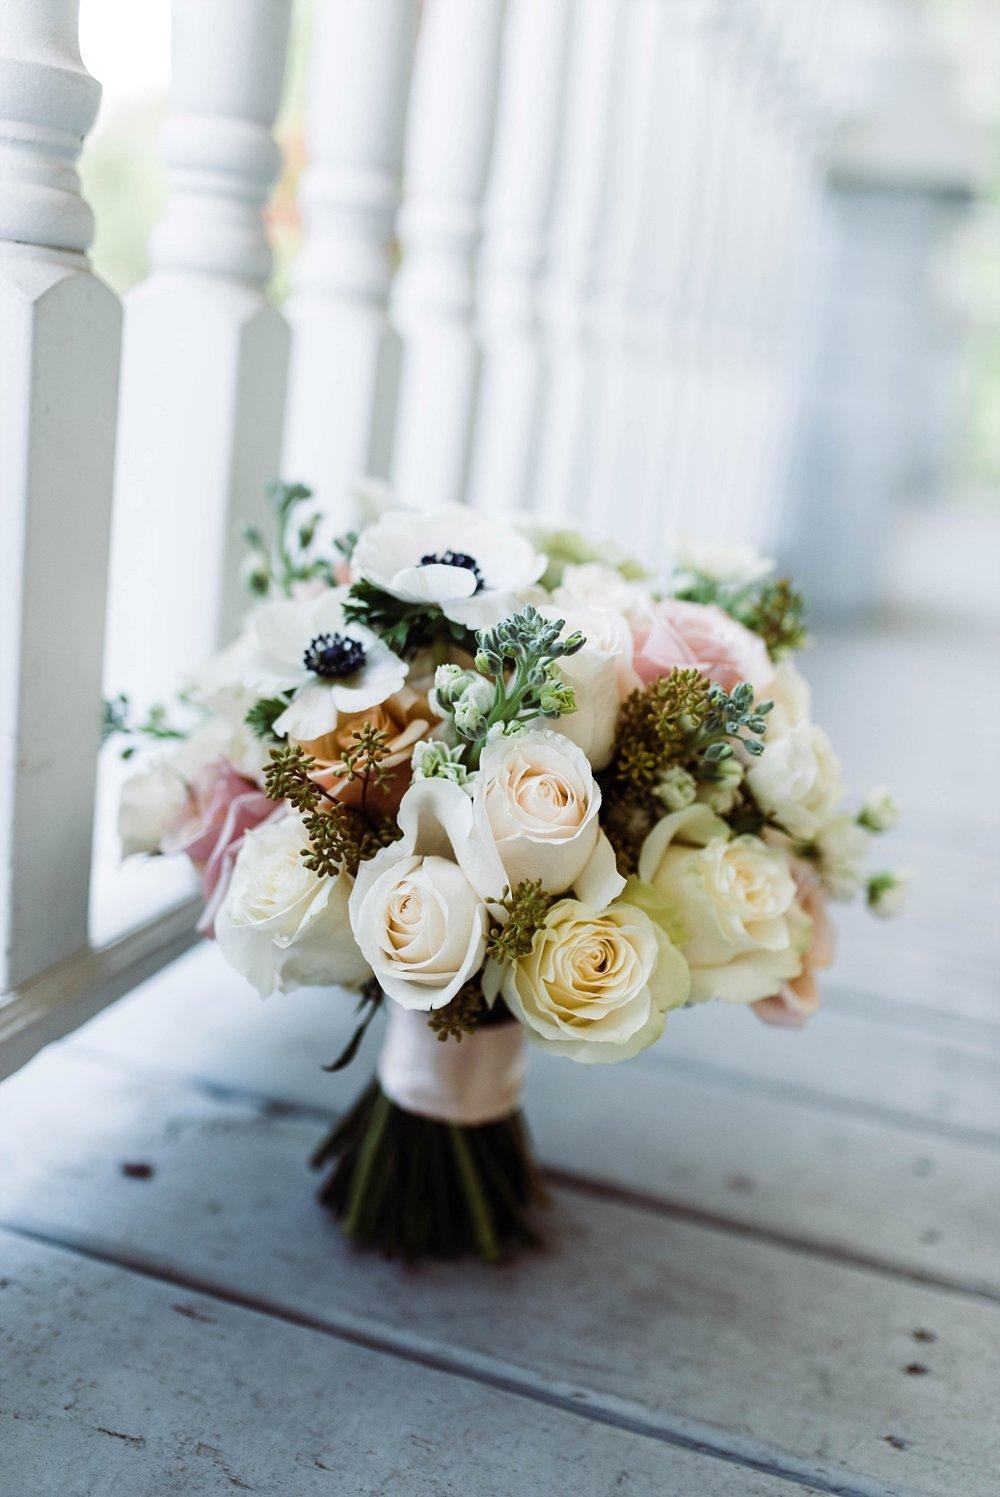 BRIDE'S BOUQUET| ELEGANT SPRING WEDDING AT THE SONNET HOUSE | TJ & SHELBY | JOHNSON WEDDING